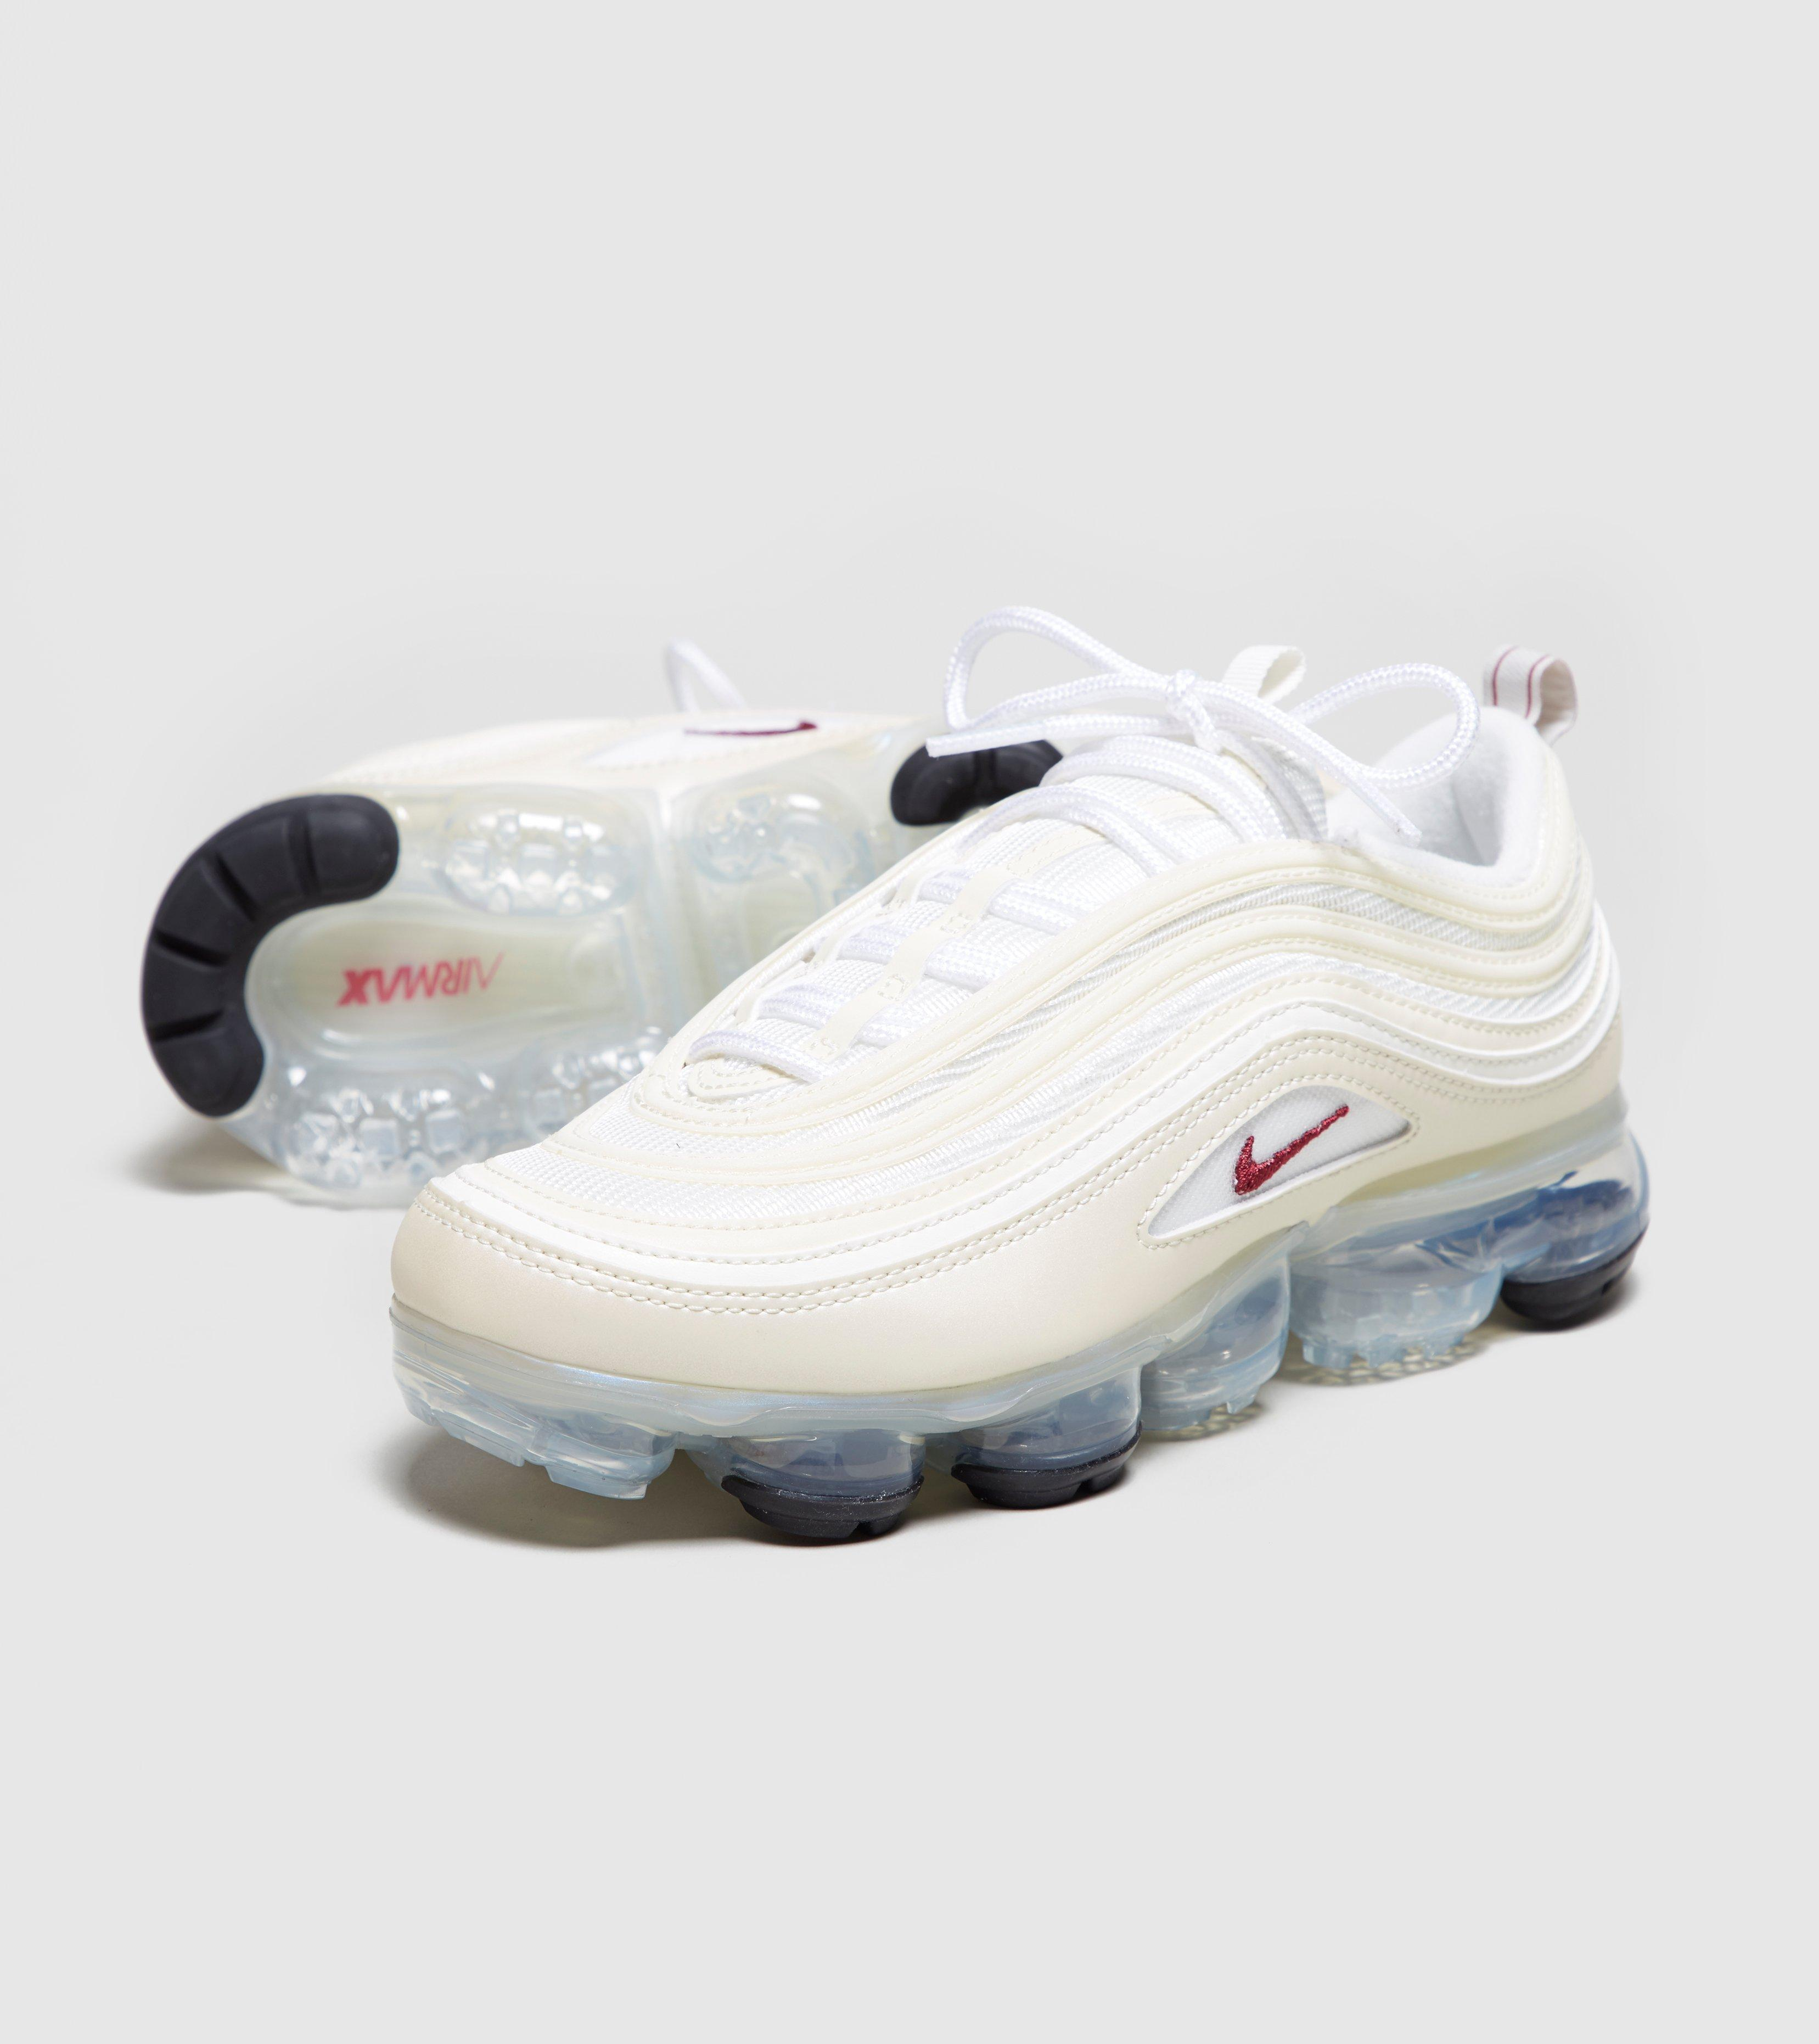 lowest price 87d2d b71b1 Nike White Air Vapormax 97 Women's